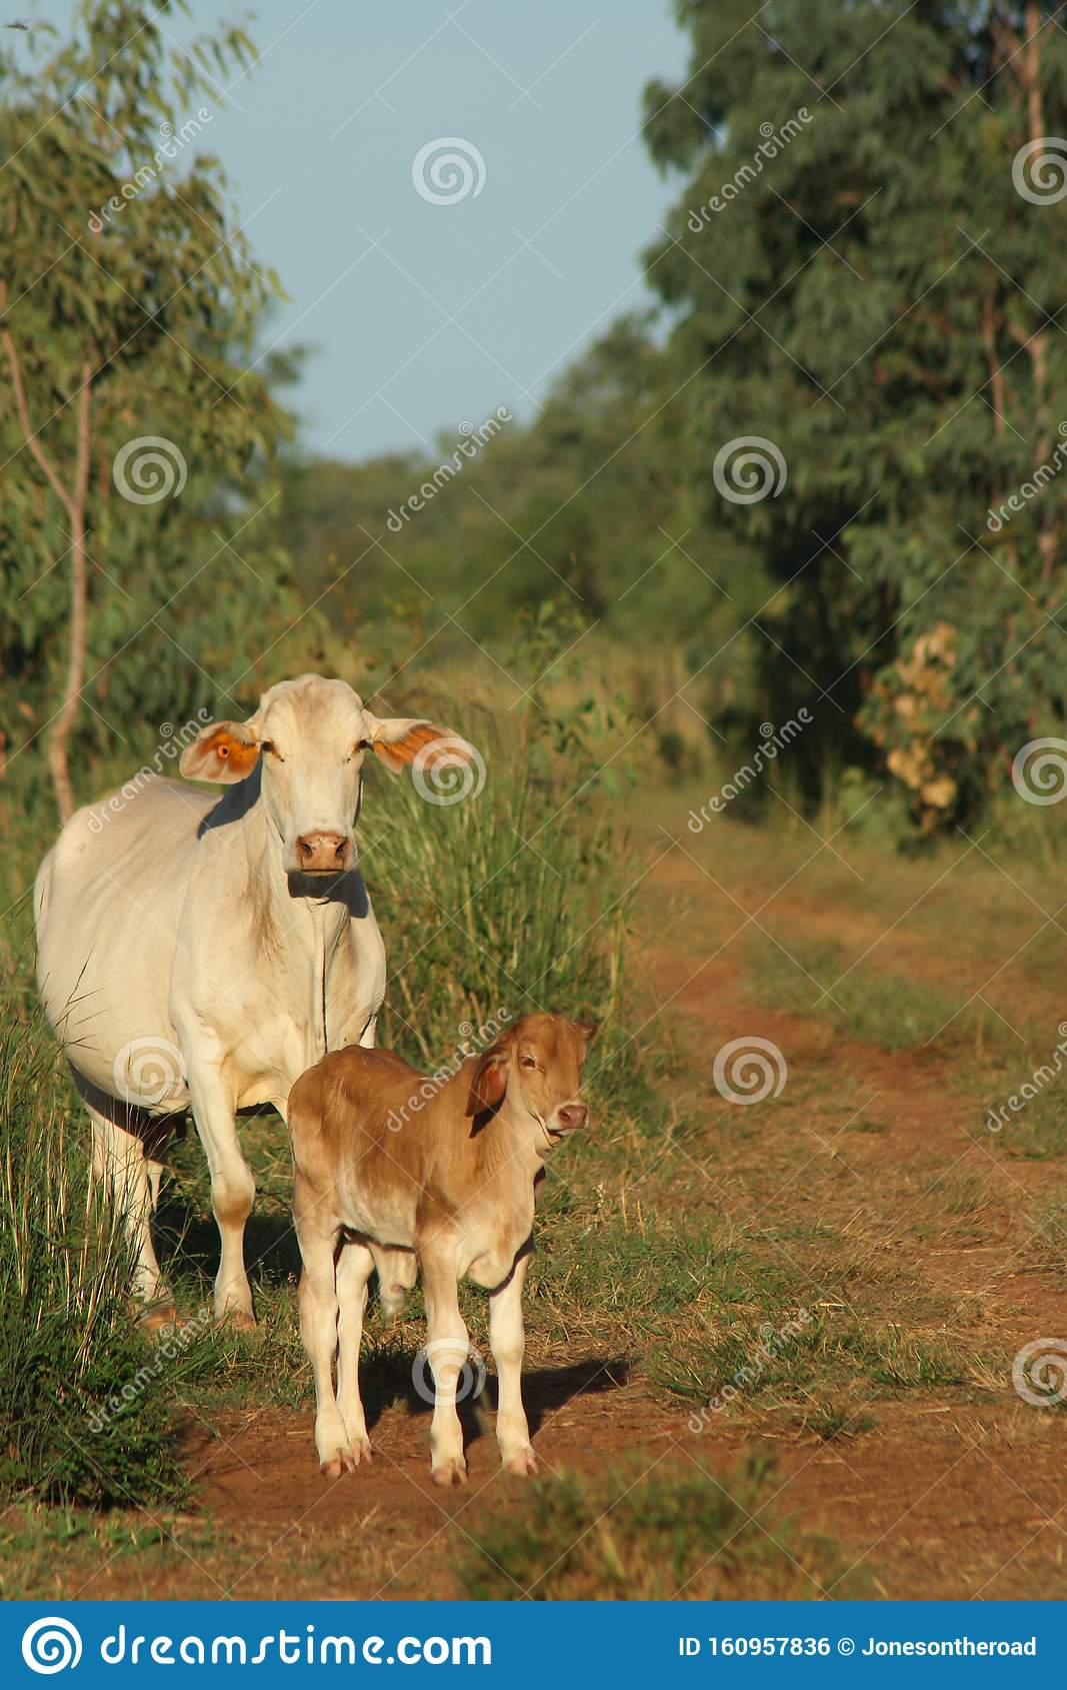 Brahman Cattle Femal With Calf On Cattle Farm Stock Photo ...